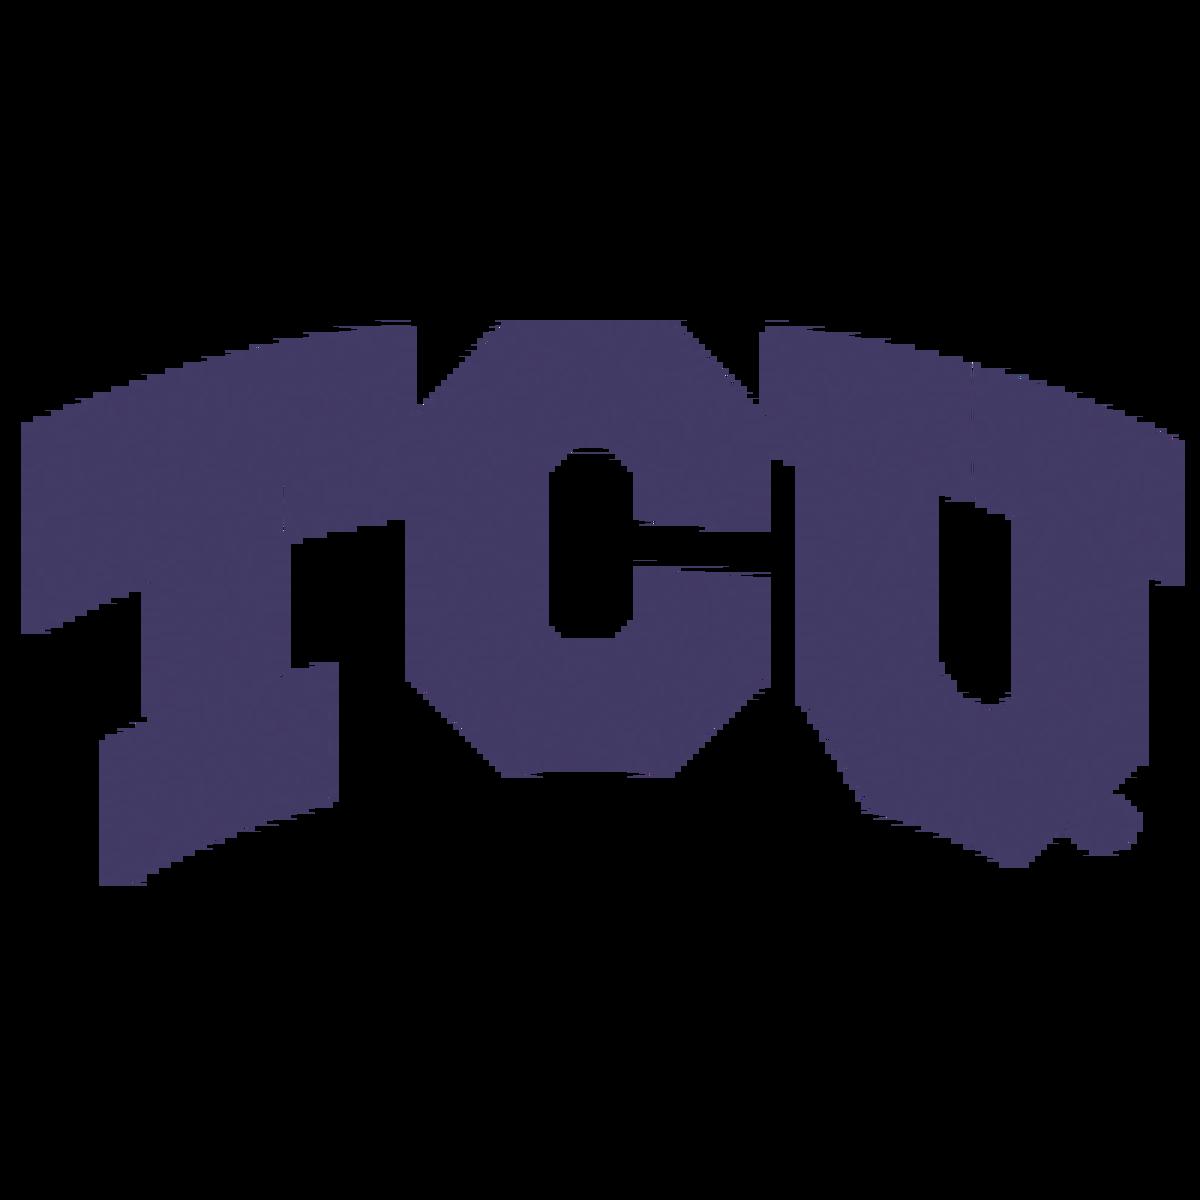 College Football Top 25 Rankings: TCU